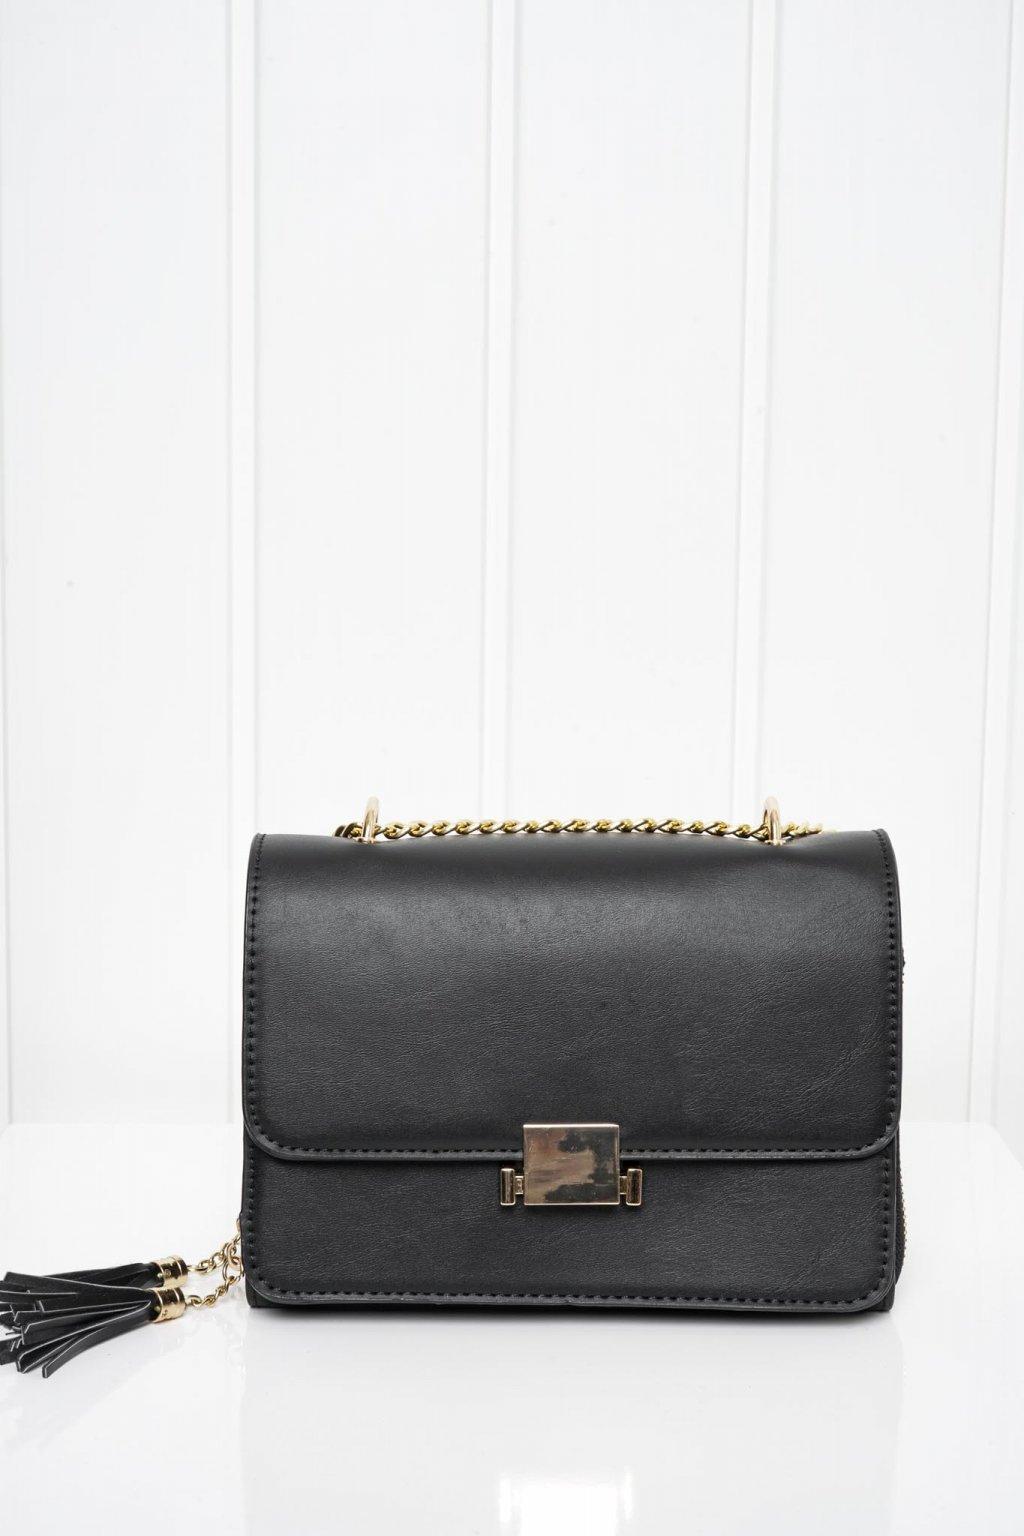 Kabelka, crossbody, ruksak, shopping bag, shopperka, 187